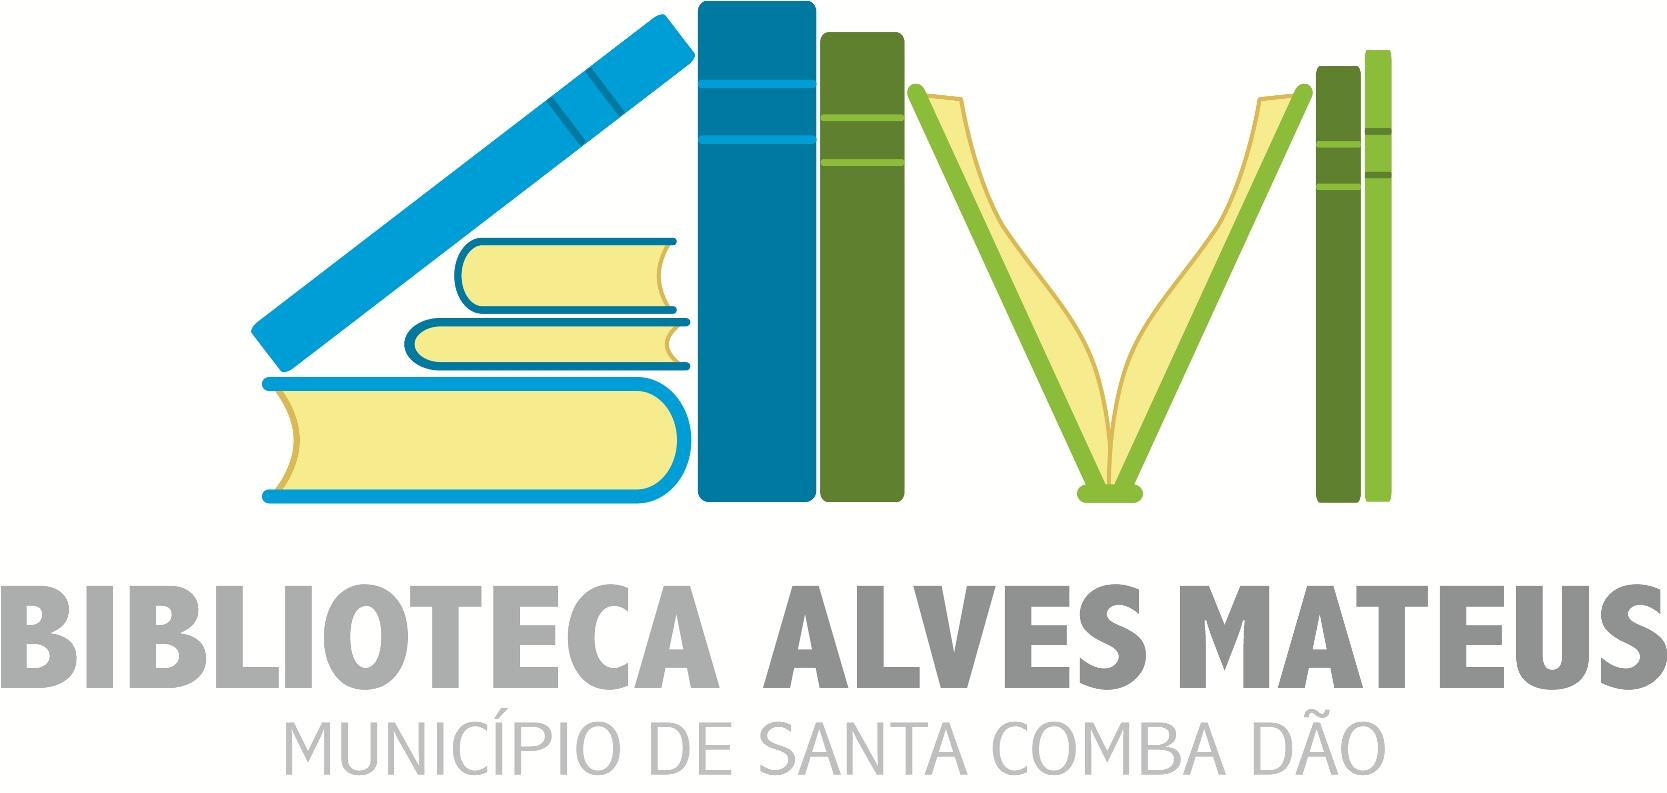 Logotipo_Biblioteca_Alves_Mateus_Medio